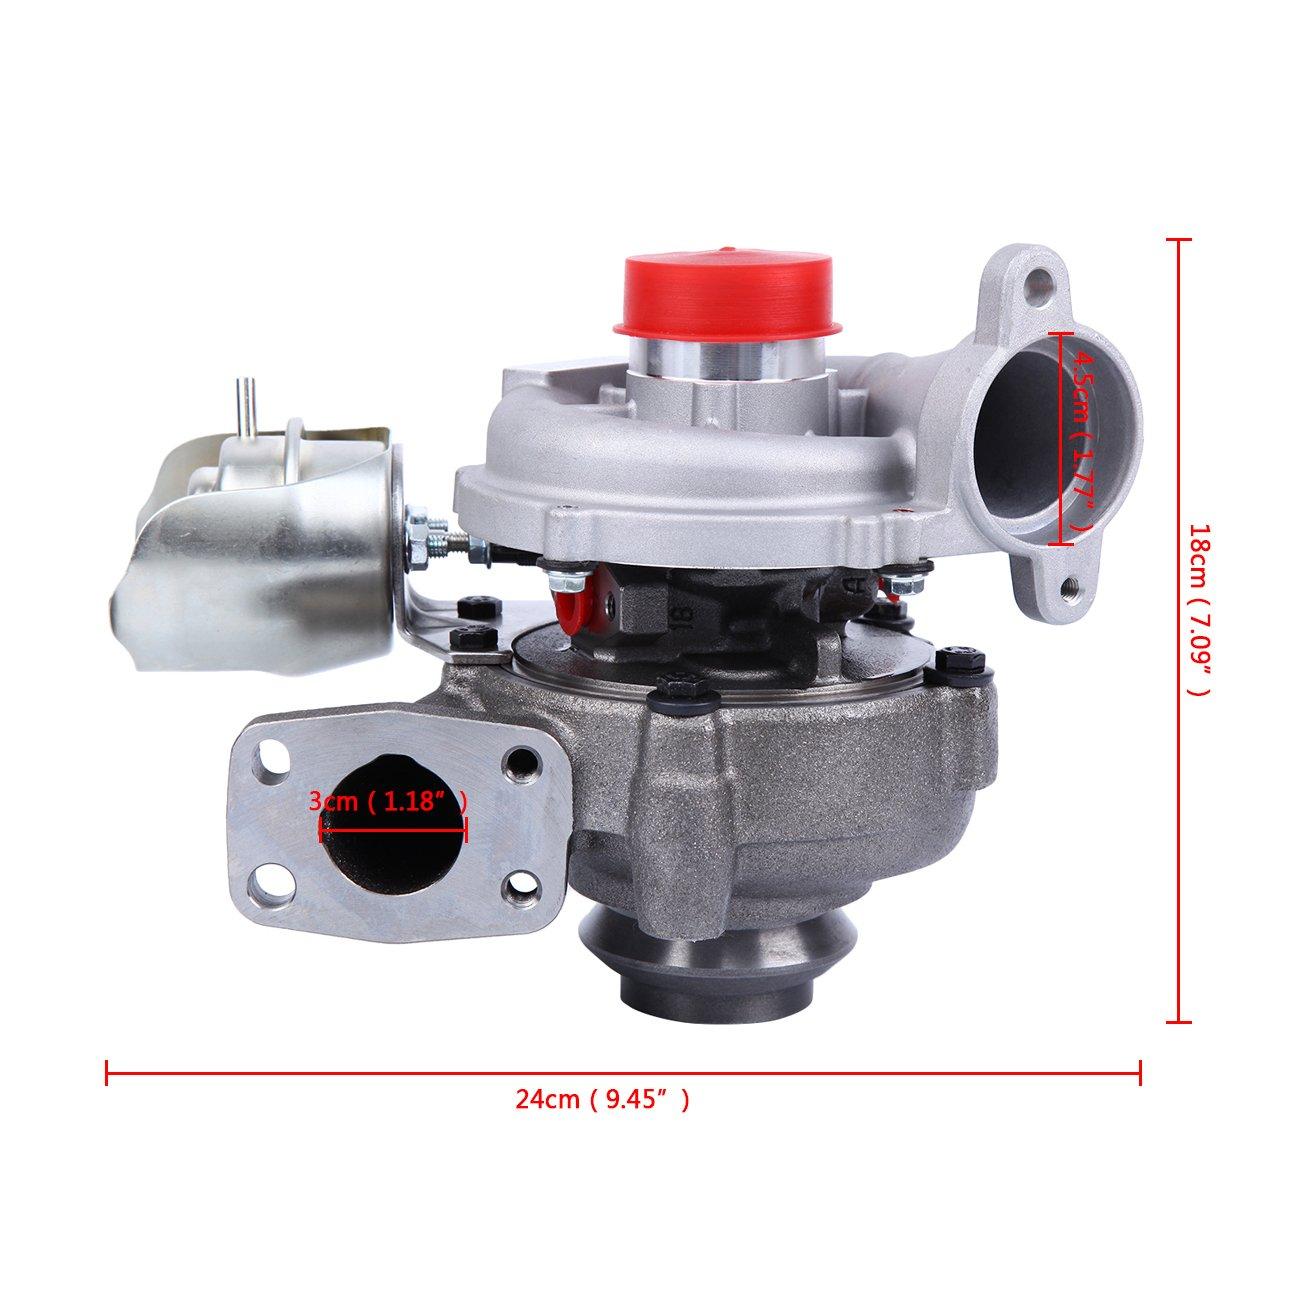 Ambienceo 1.6 HDI TDCI 109 hp turbocompresseur turbocompresseur 80KW Turbo Space Scenic Kit...: Amazon.es: Coche y moto